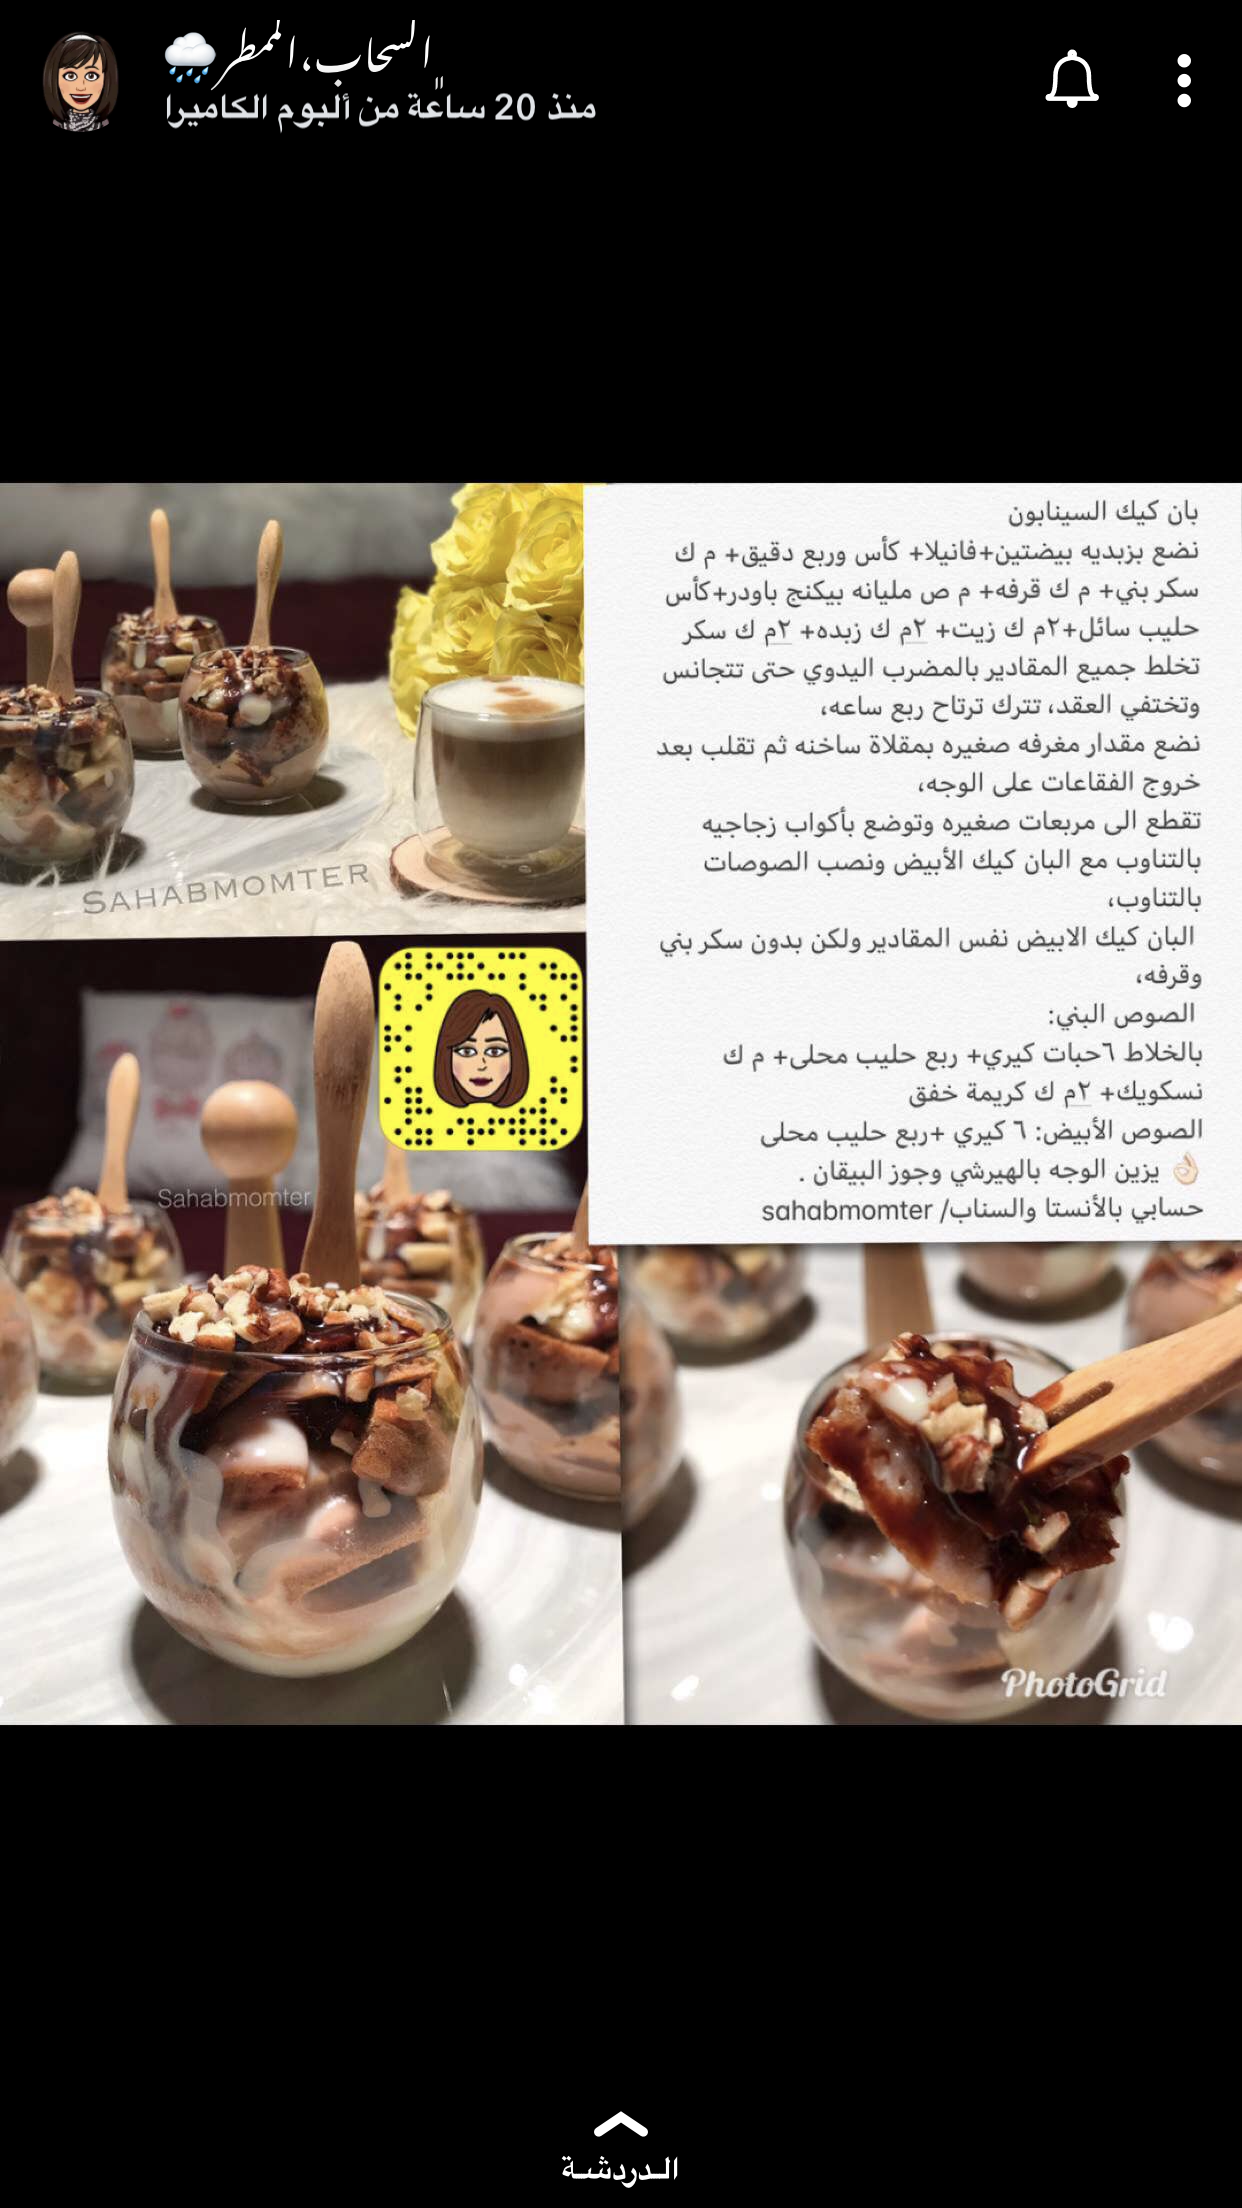 Pin By Majd On طبخ وتقديمات Food Arabic Food Desserts